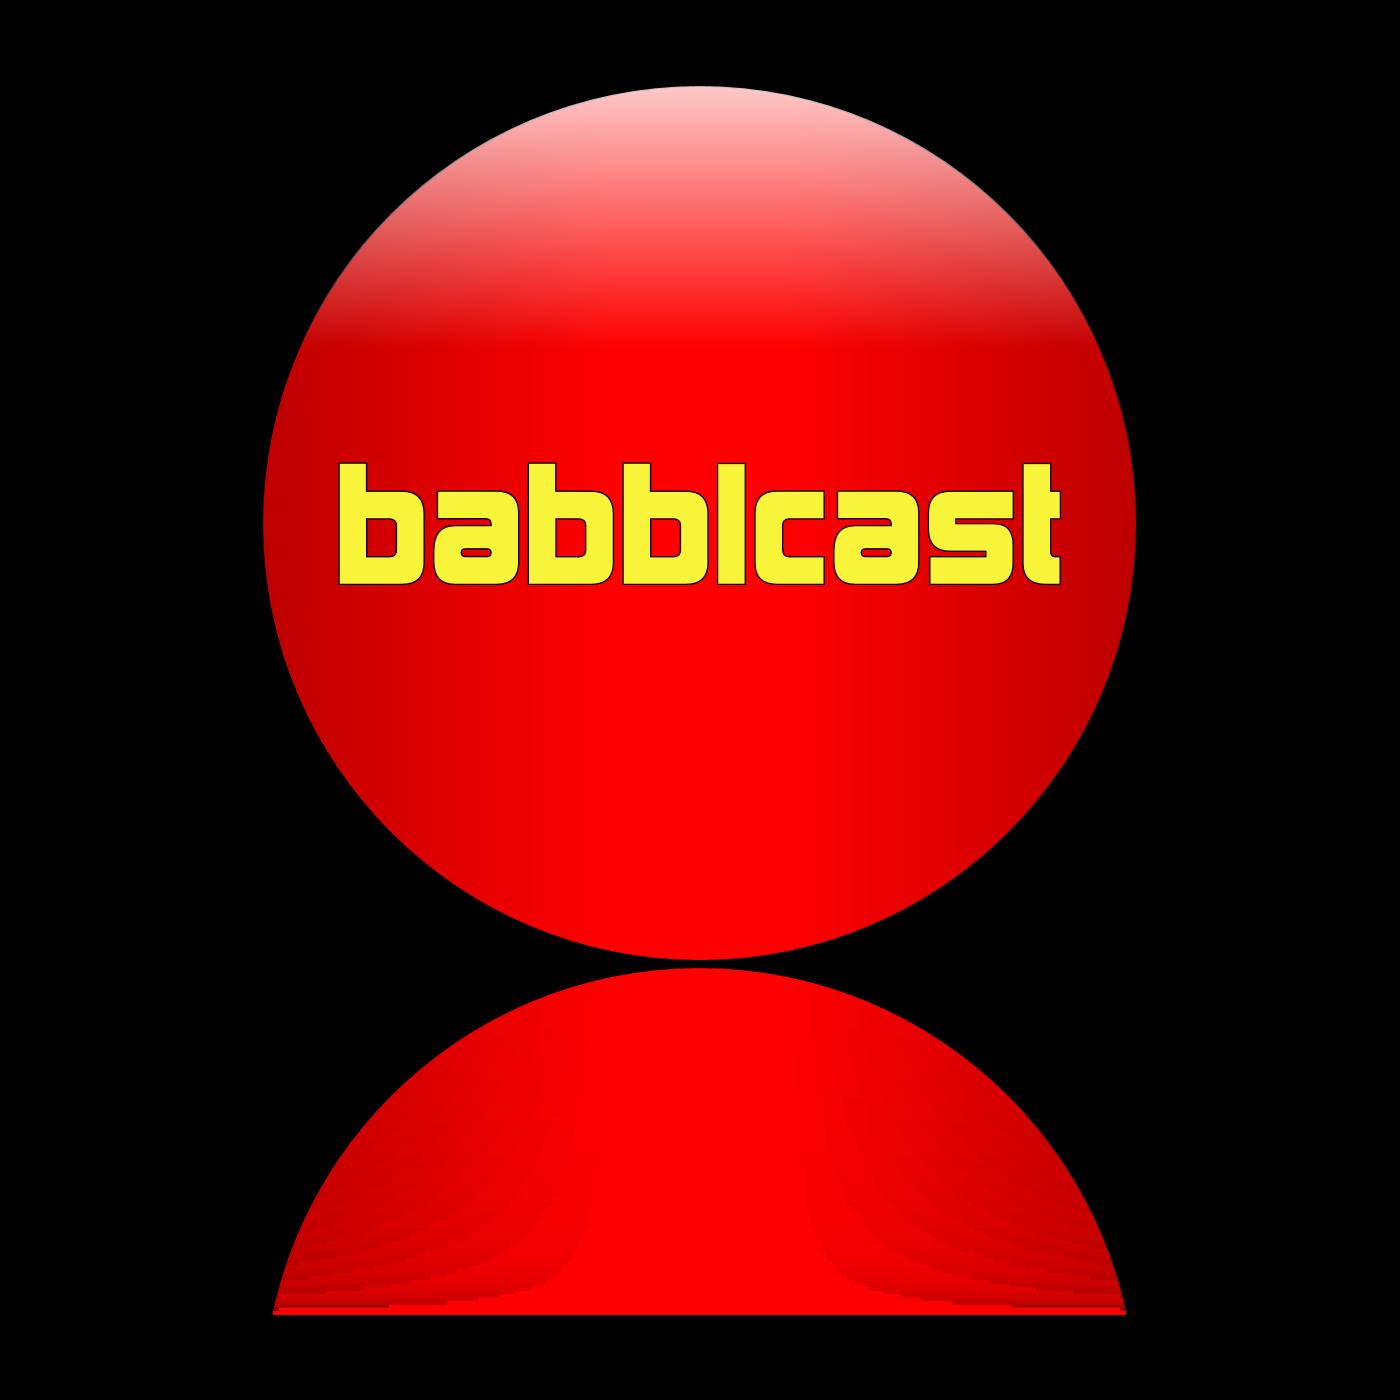 babblcast